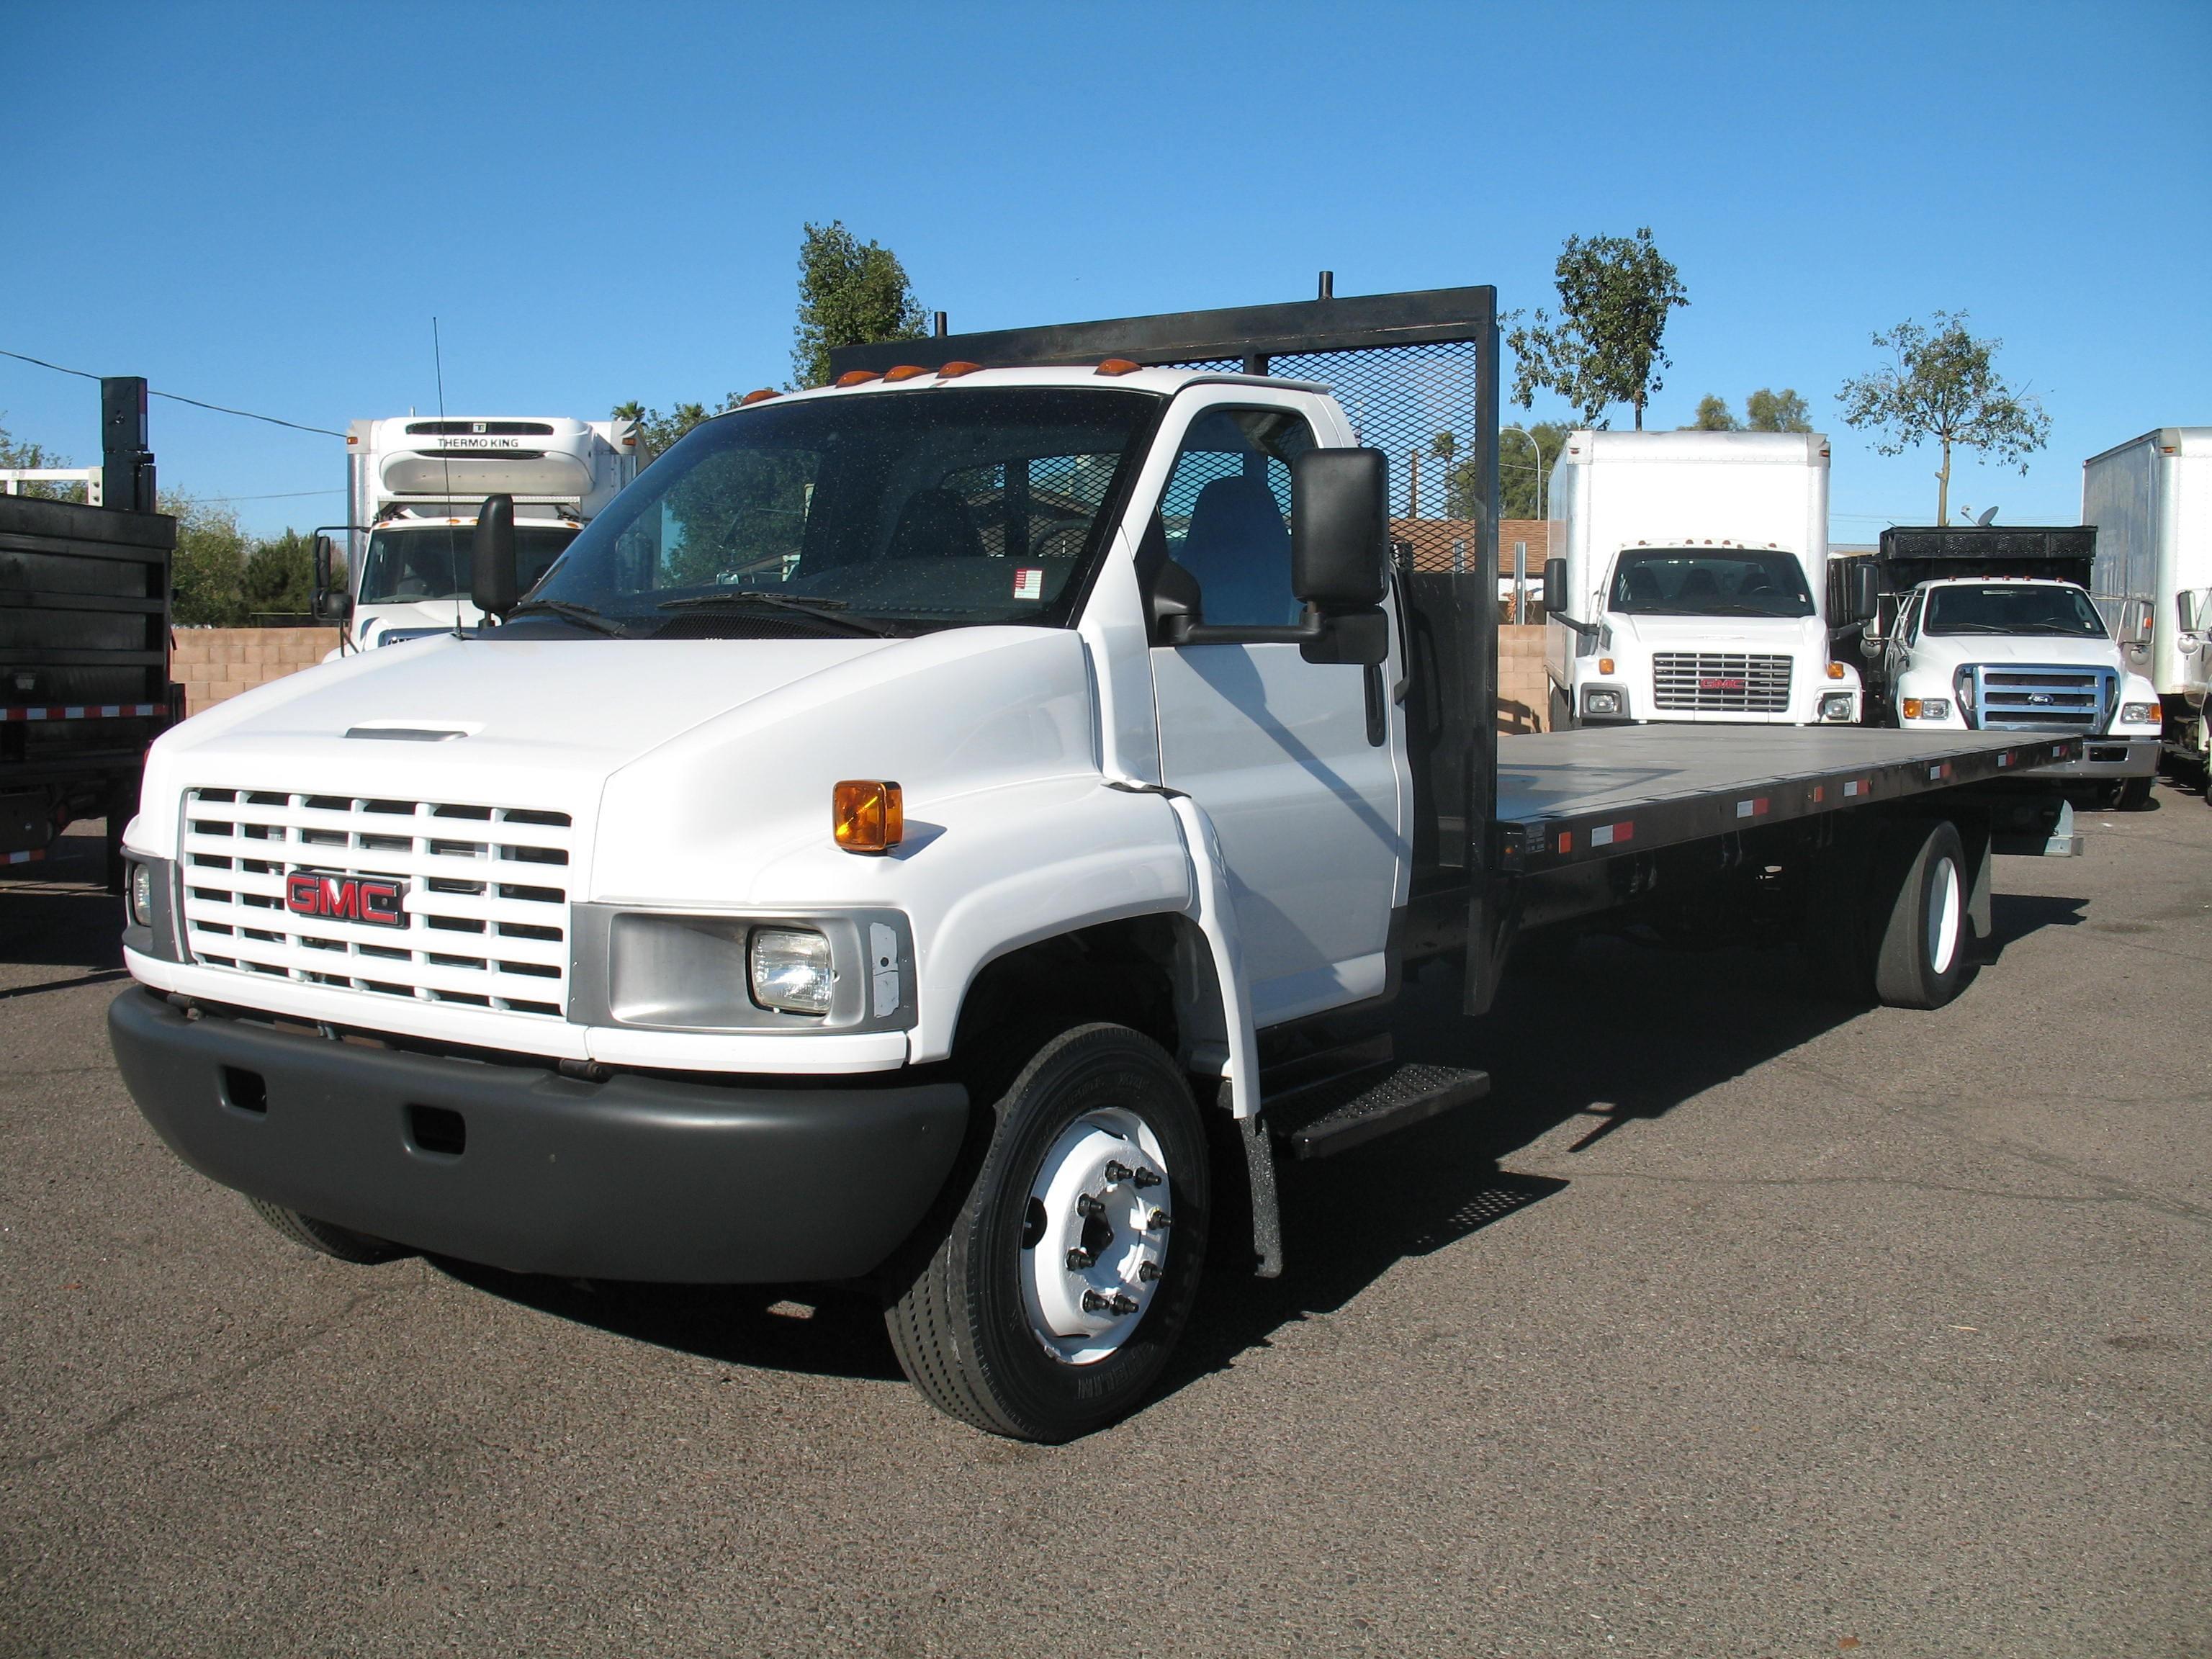 Used, 2005, GMC, C-5500 Topkick, Flatbed Trucks